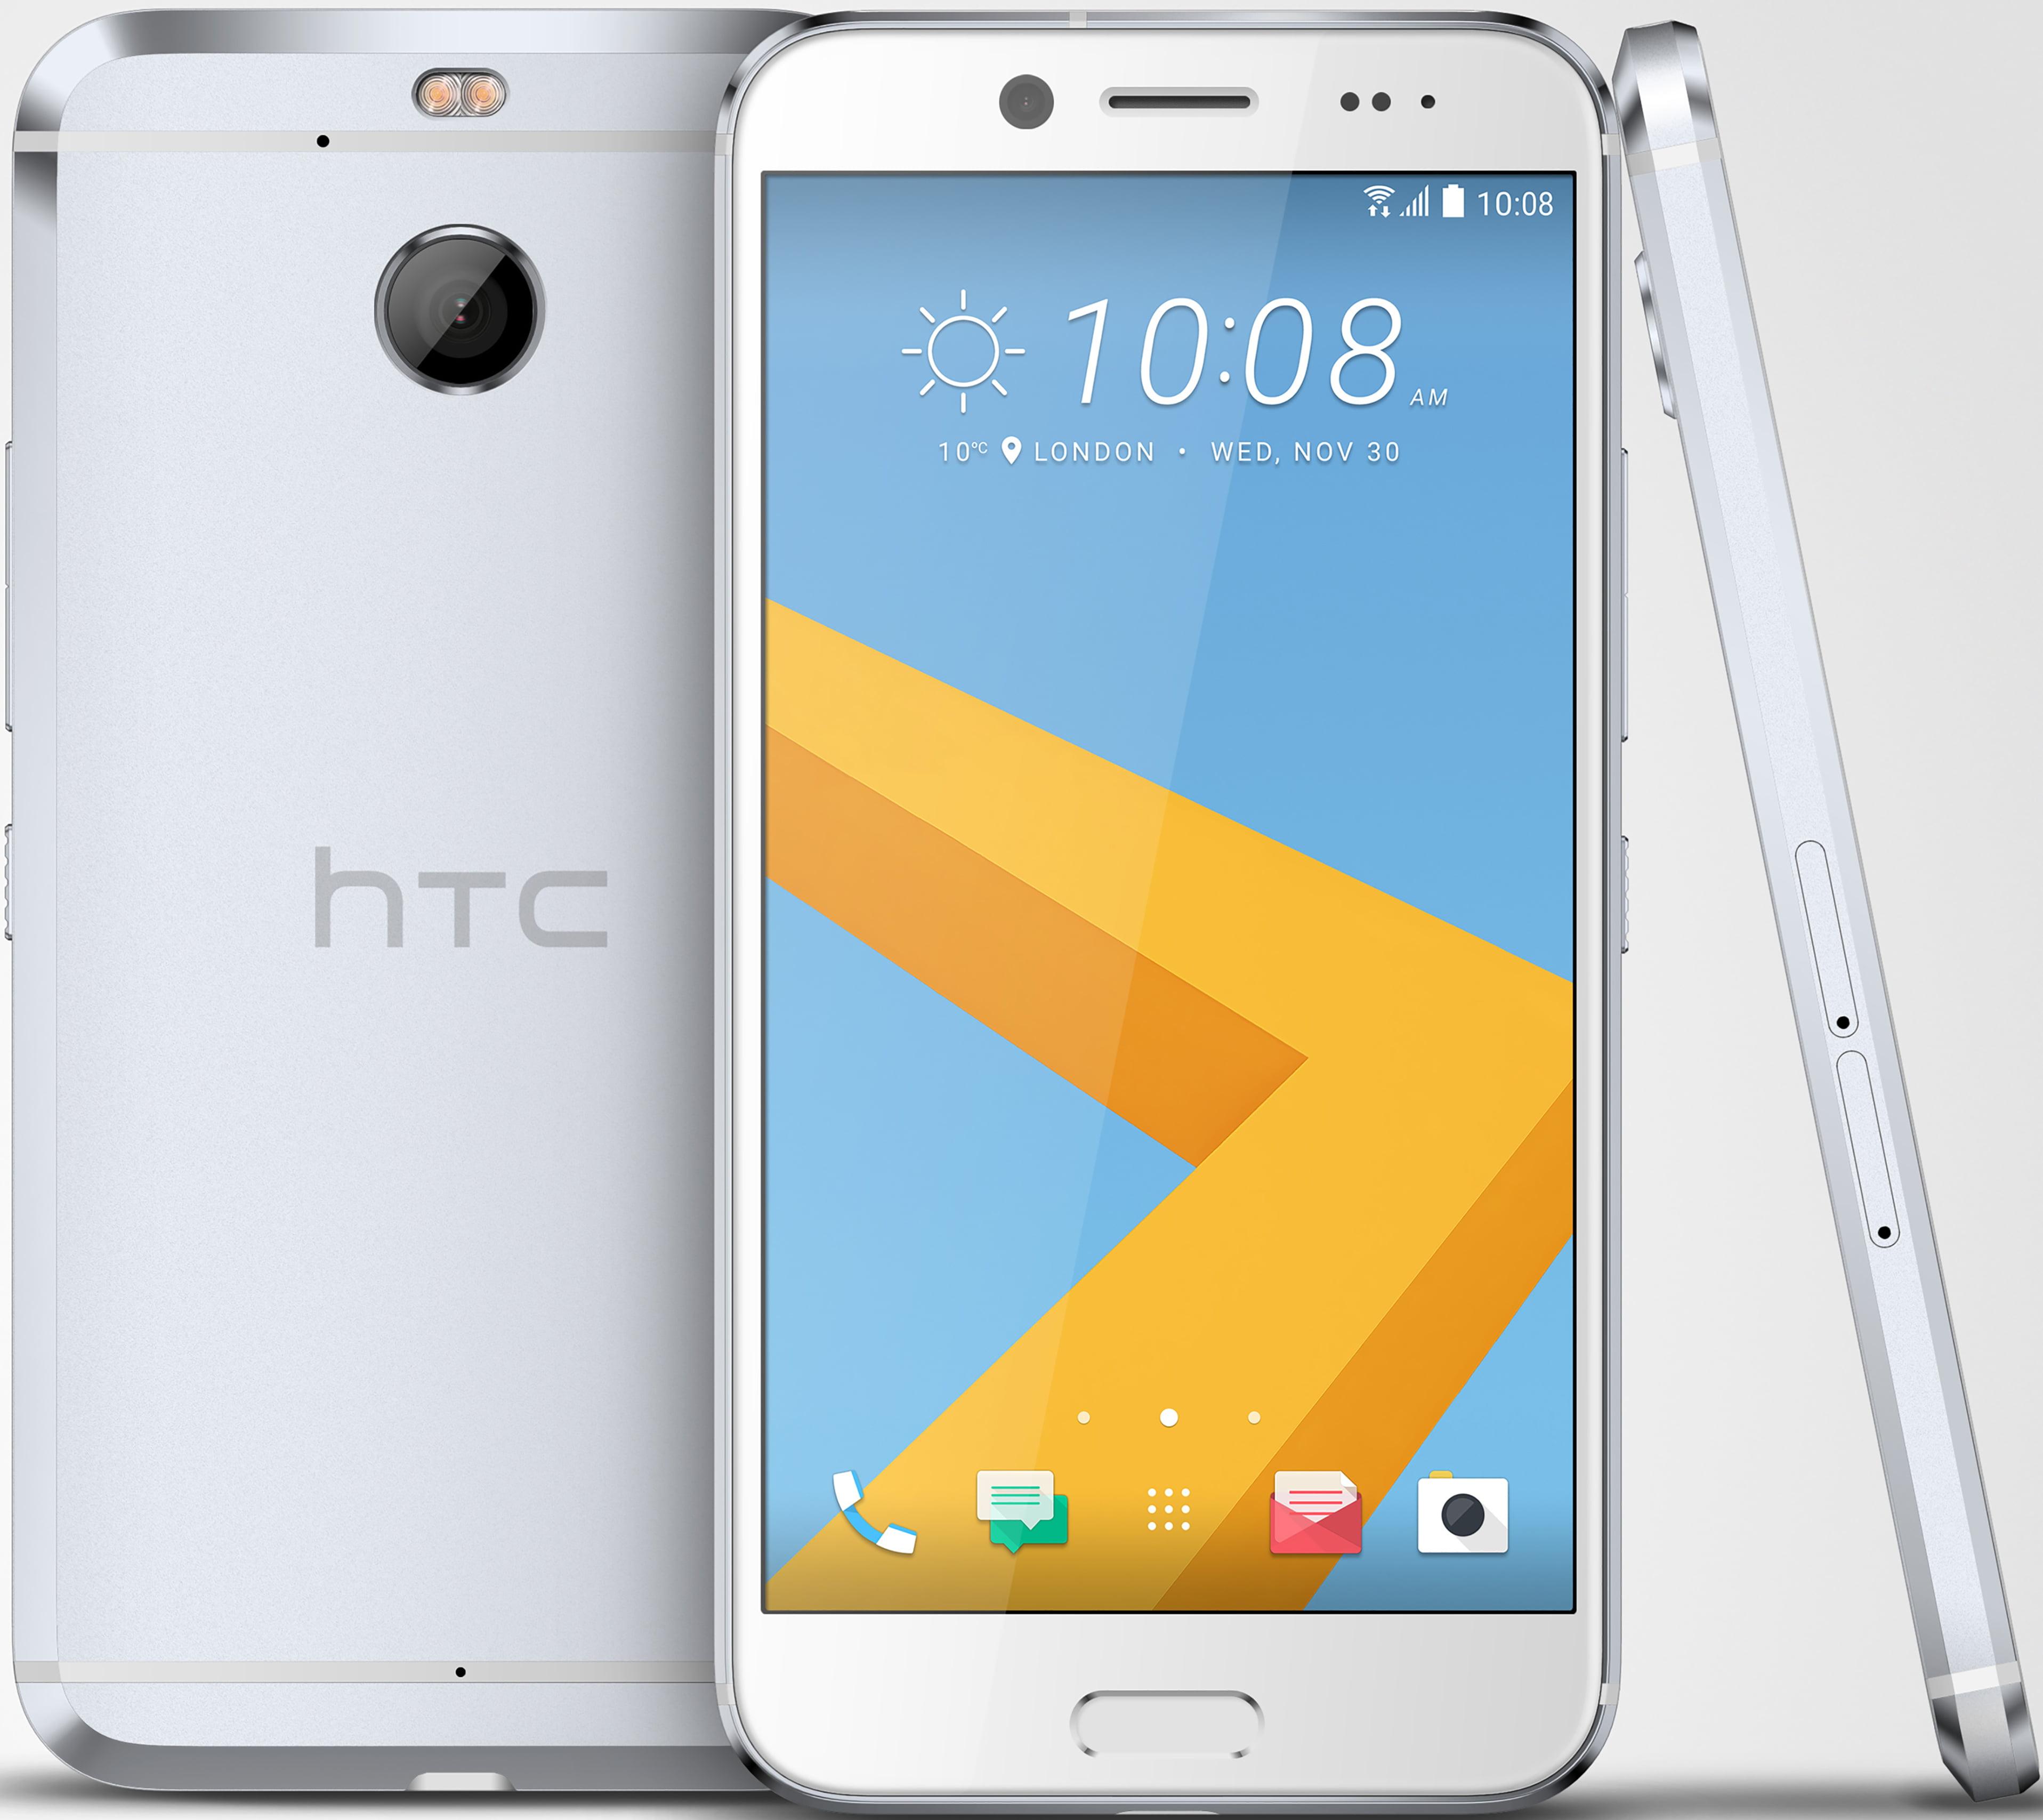 HTC 10 evo 32GB Unlocked GSM 4G LTE Octa-Core Rugged Phone w  16MP Camera Glacial Silver by HTC